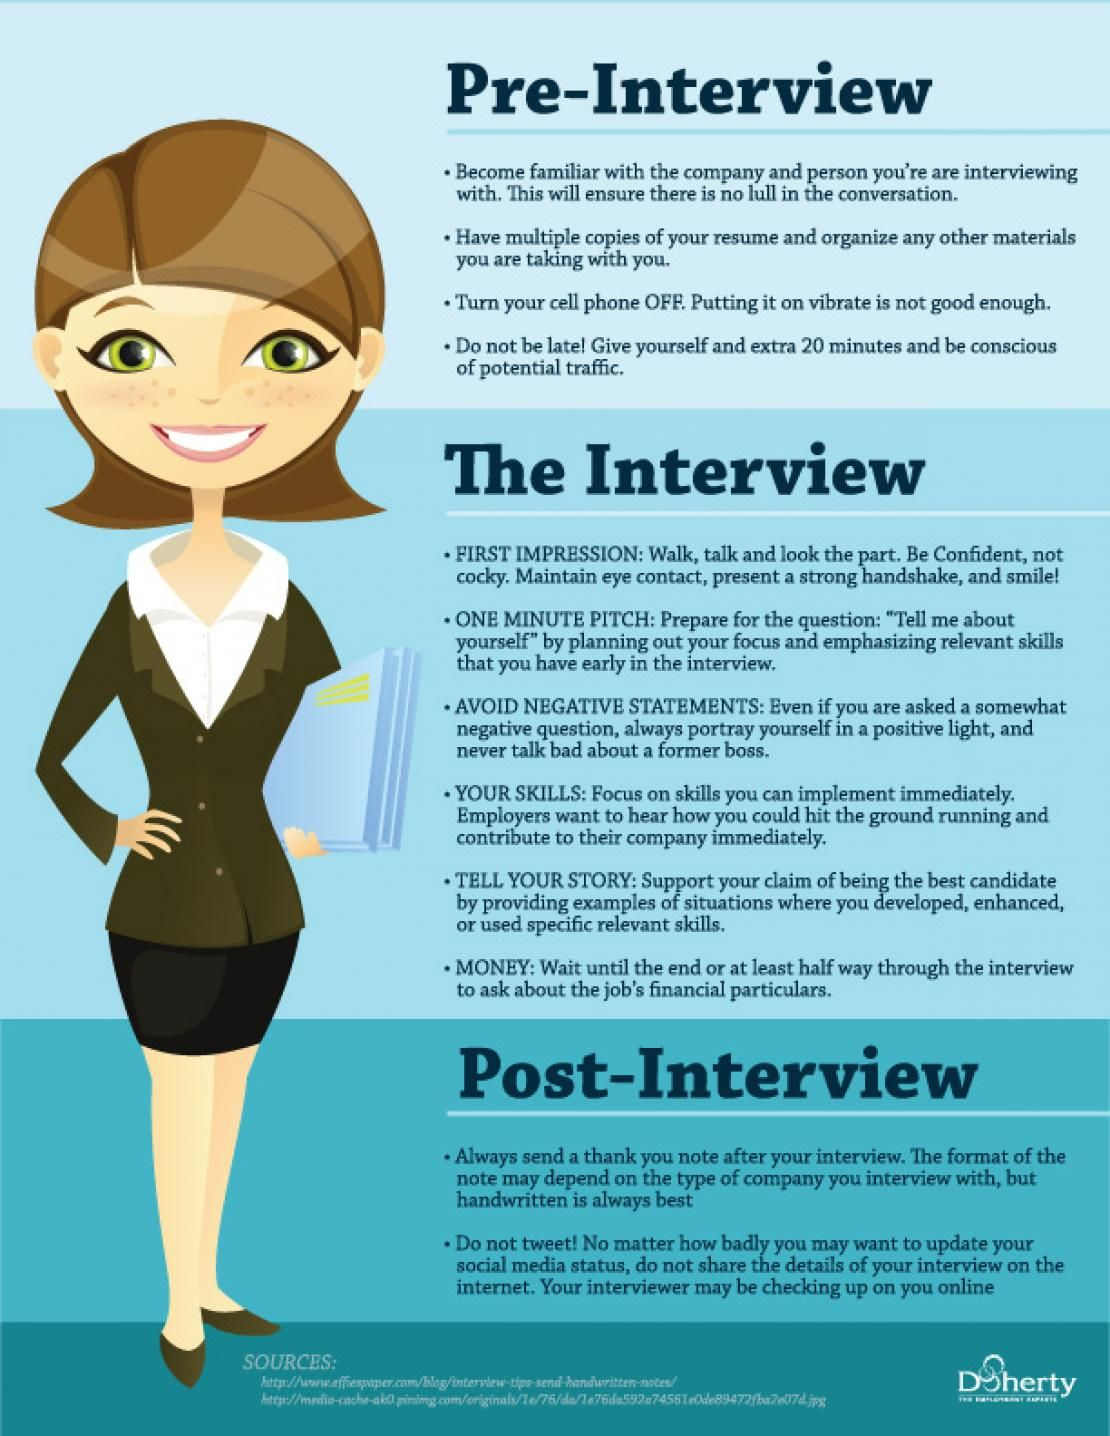 Pin By Susan Warburton On Interviewing Job Interview Advice Job Career Interview Skills